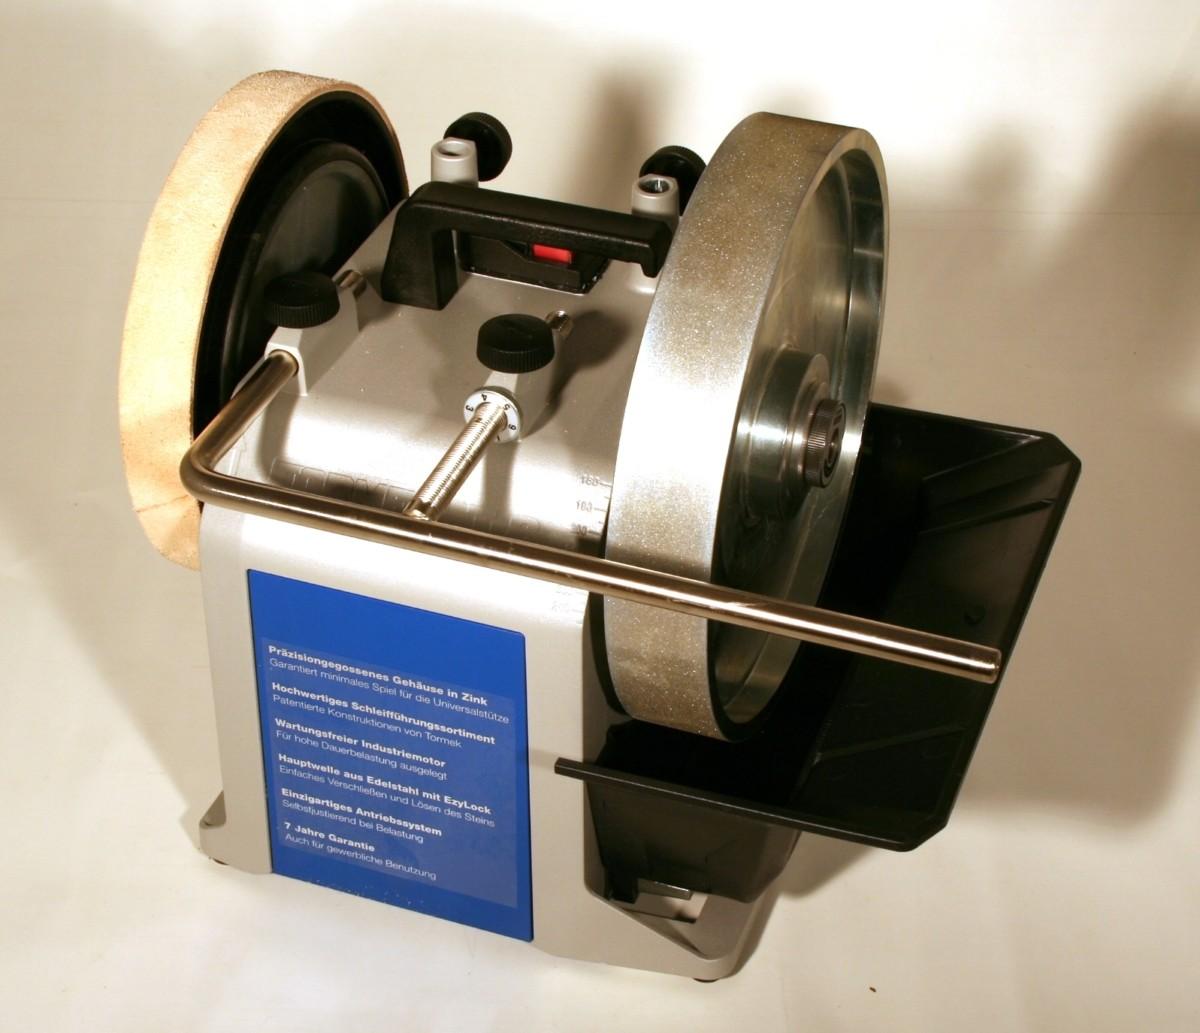 Super Tormek T8 With Cbn Wheel Camellatalisay Diy Chair Ideas Camellatalisaycom